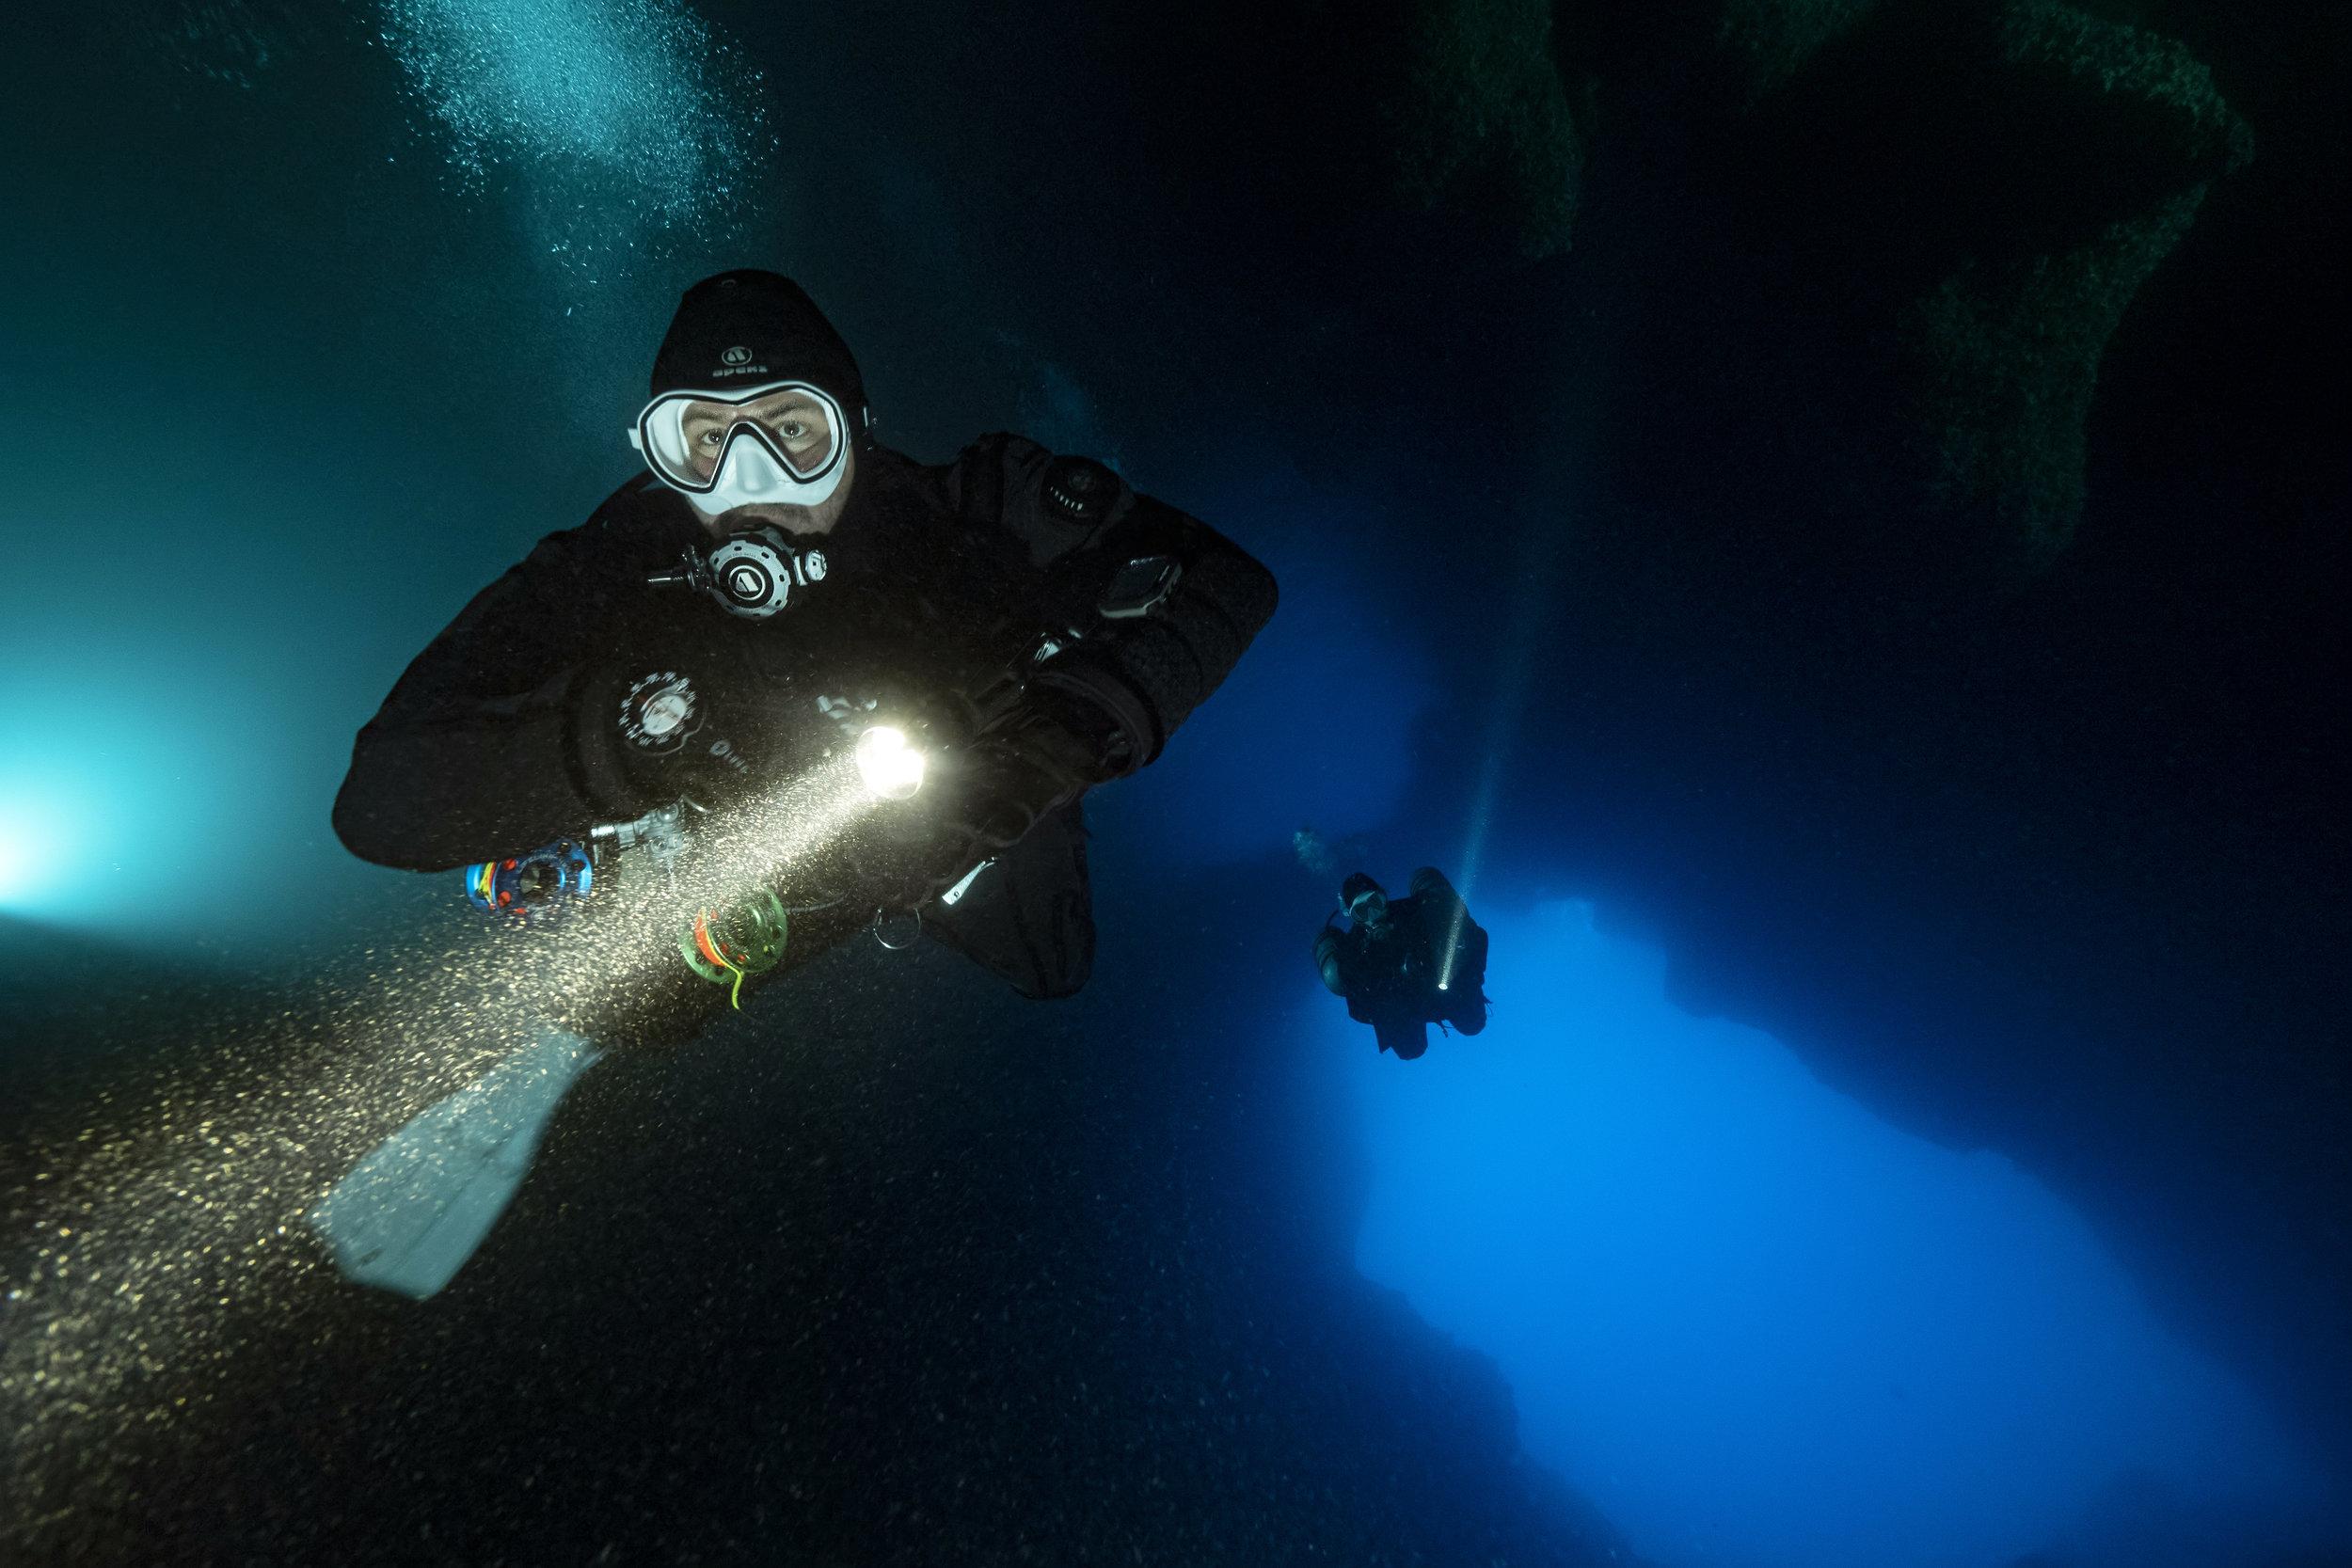 PADI Deep Diver Specialty Course — Rowand's Reef Scuba Shop